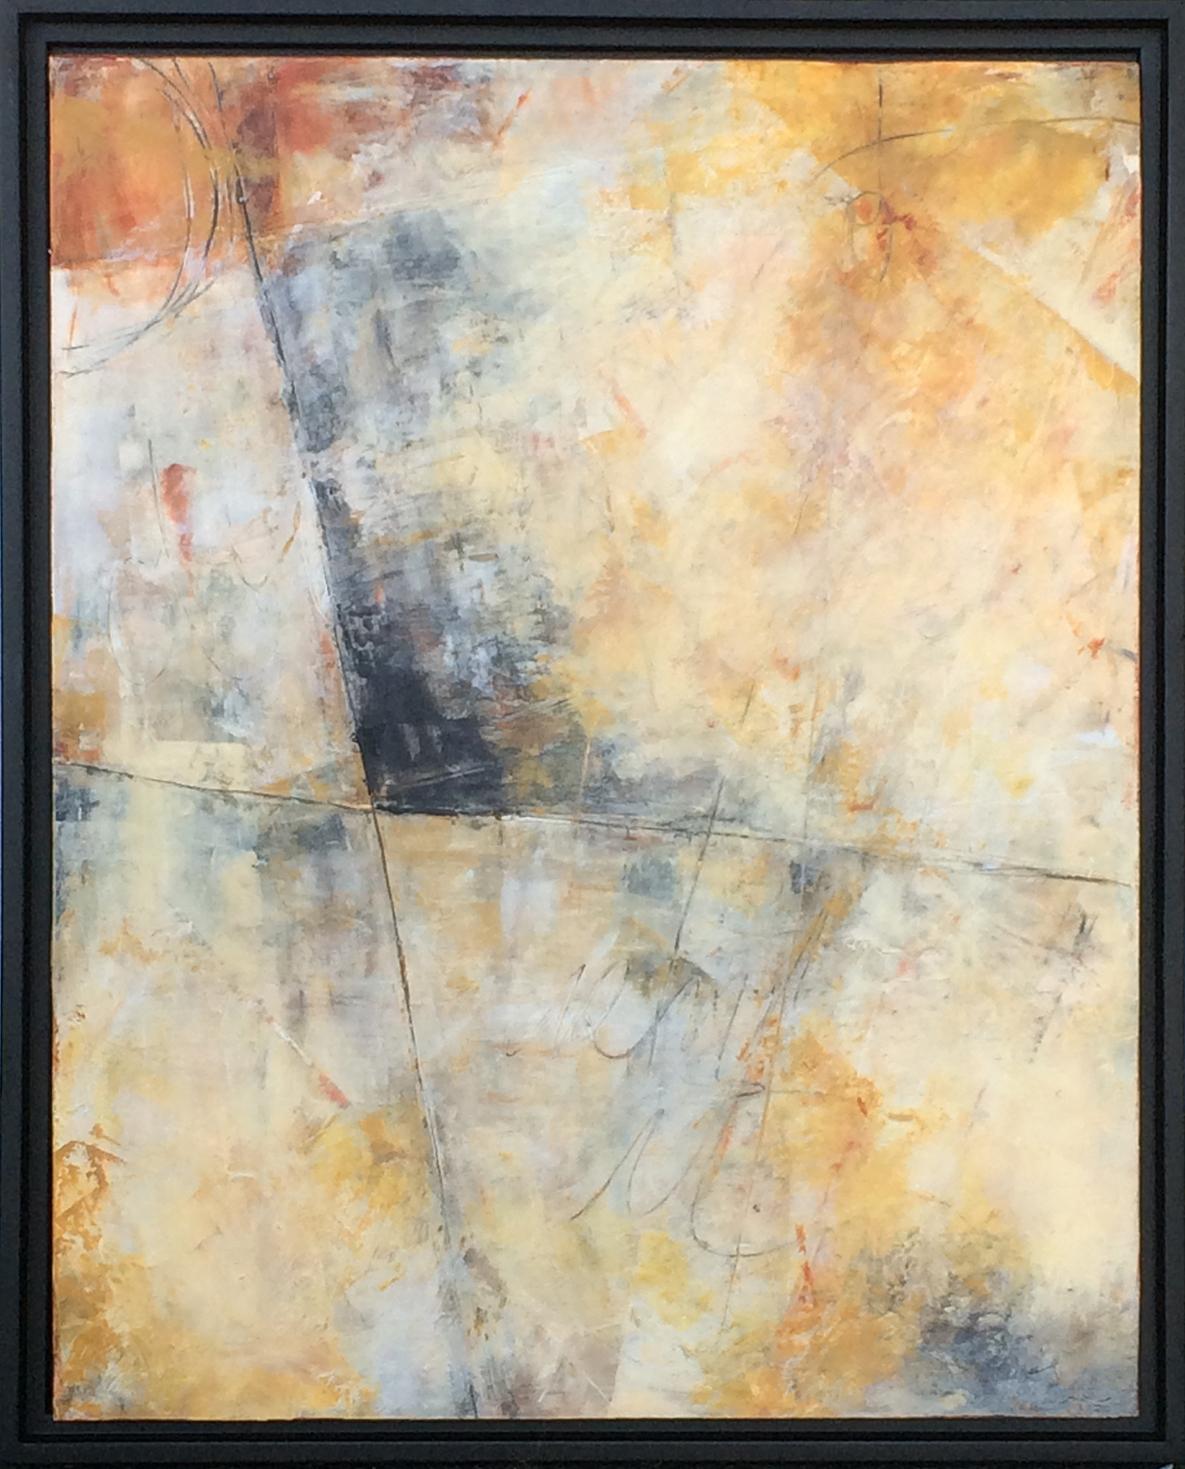 '15 Gallery